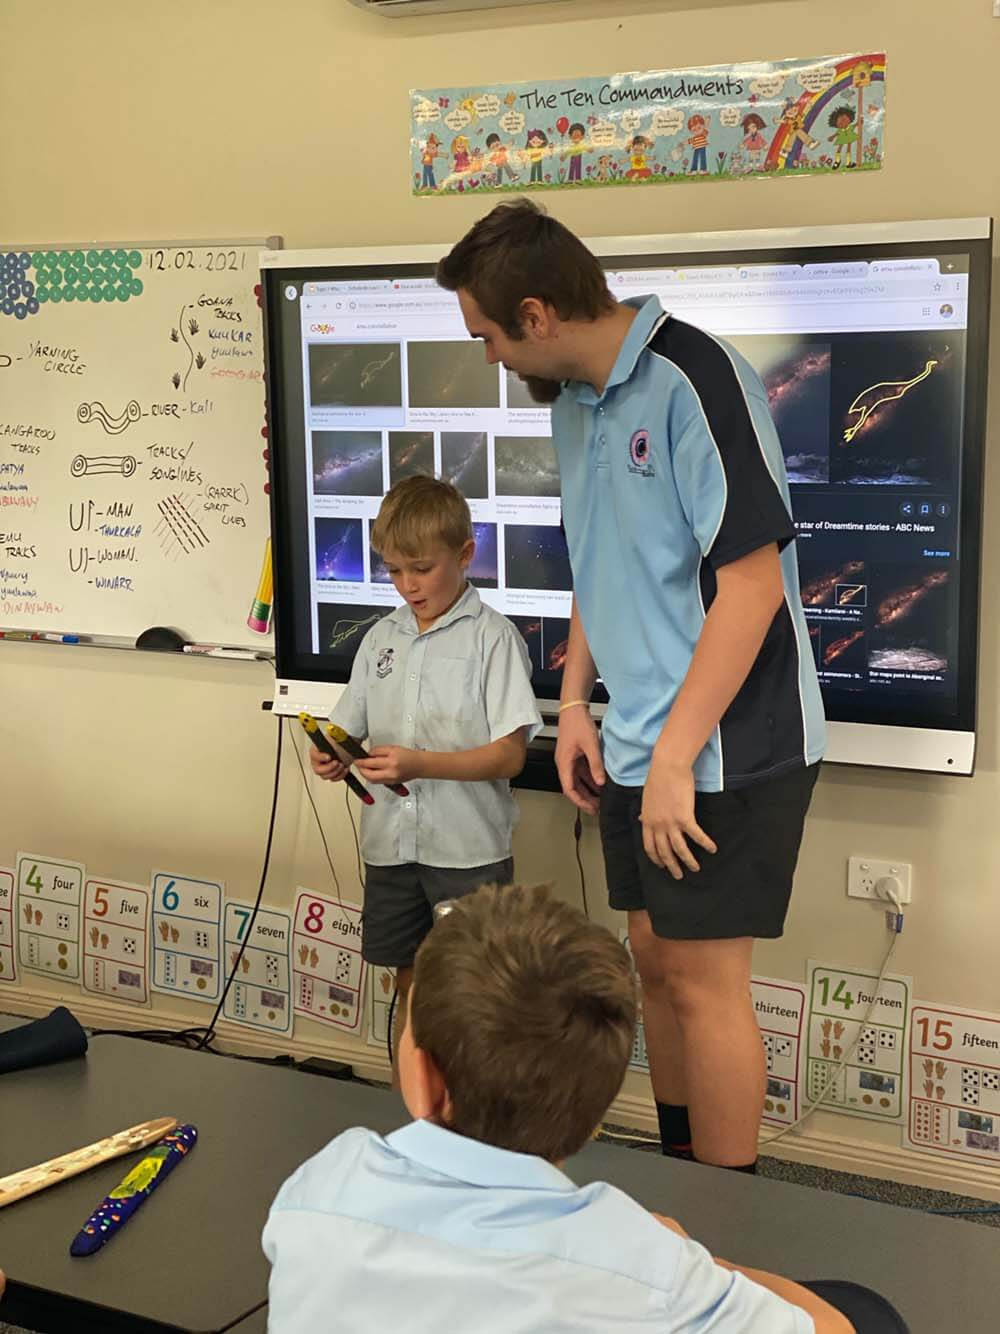 Khan Barnes helping a school student present